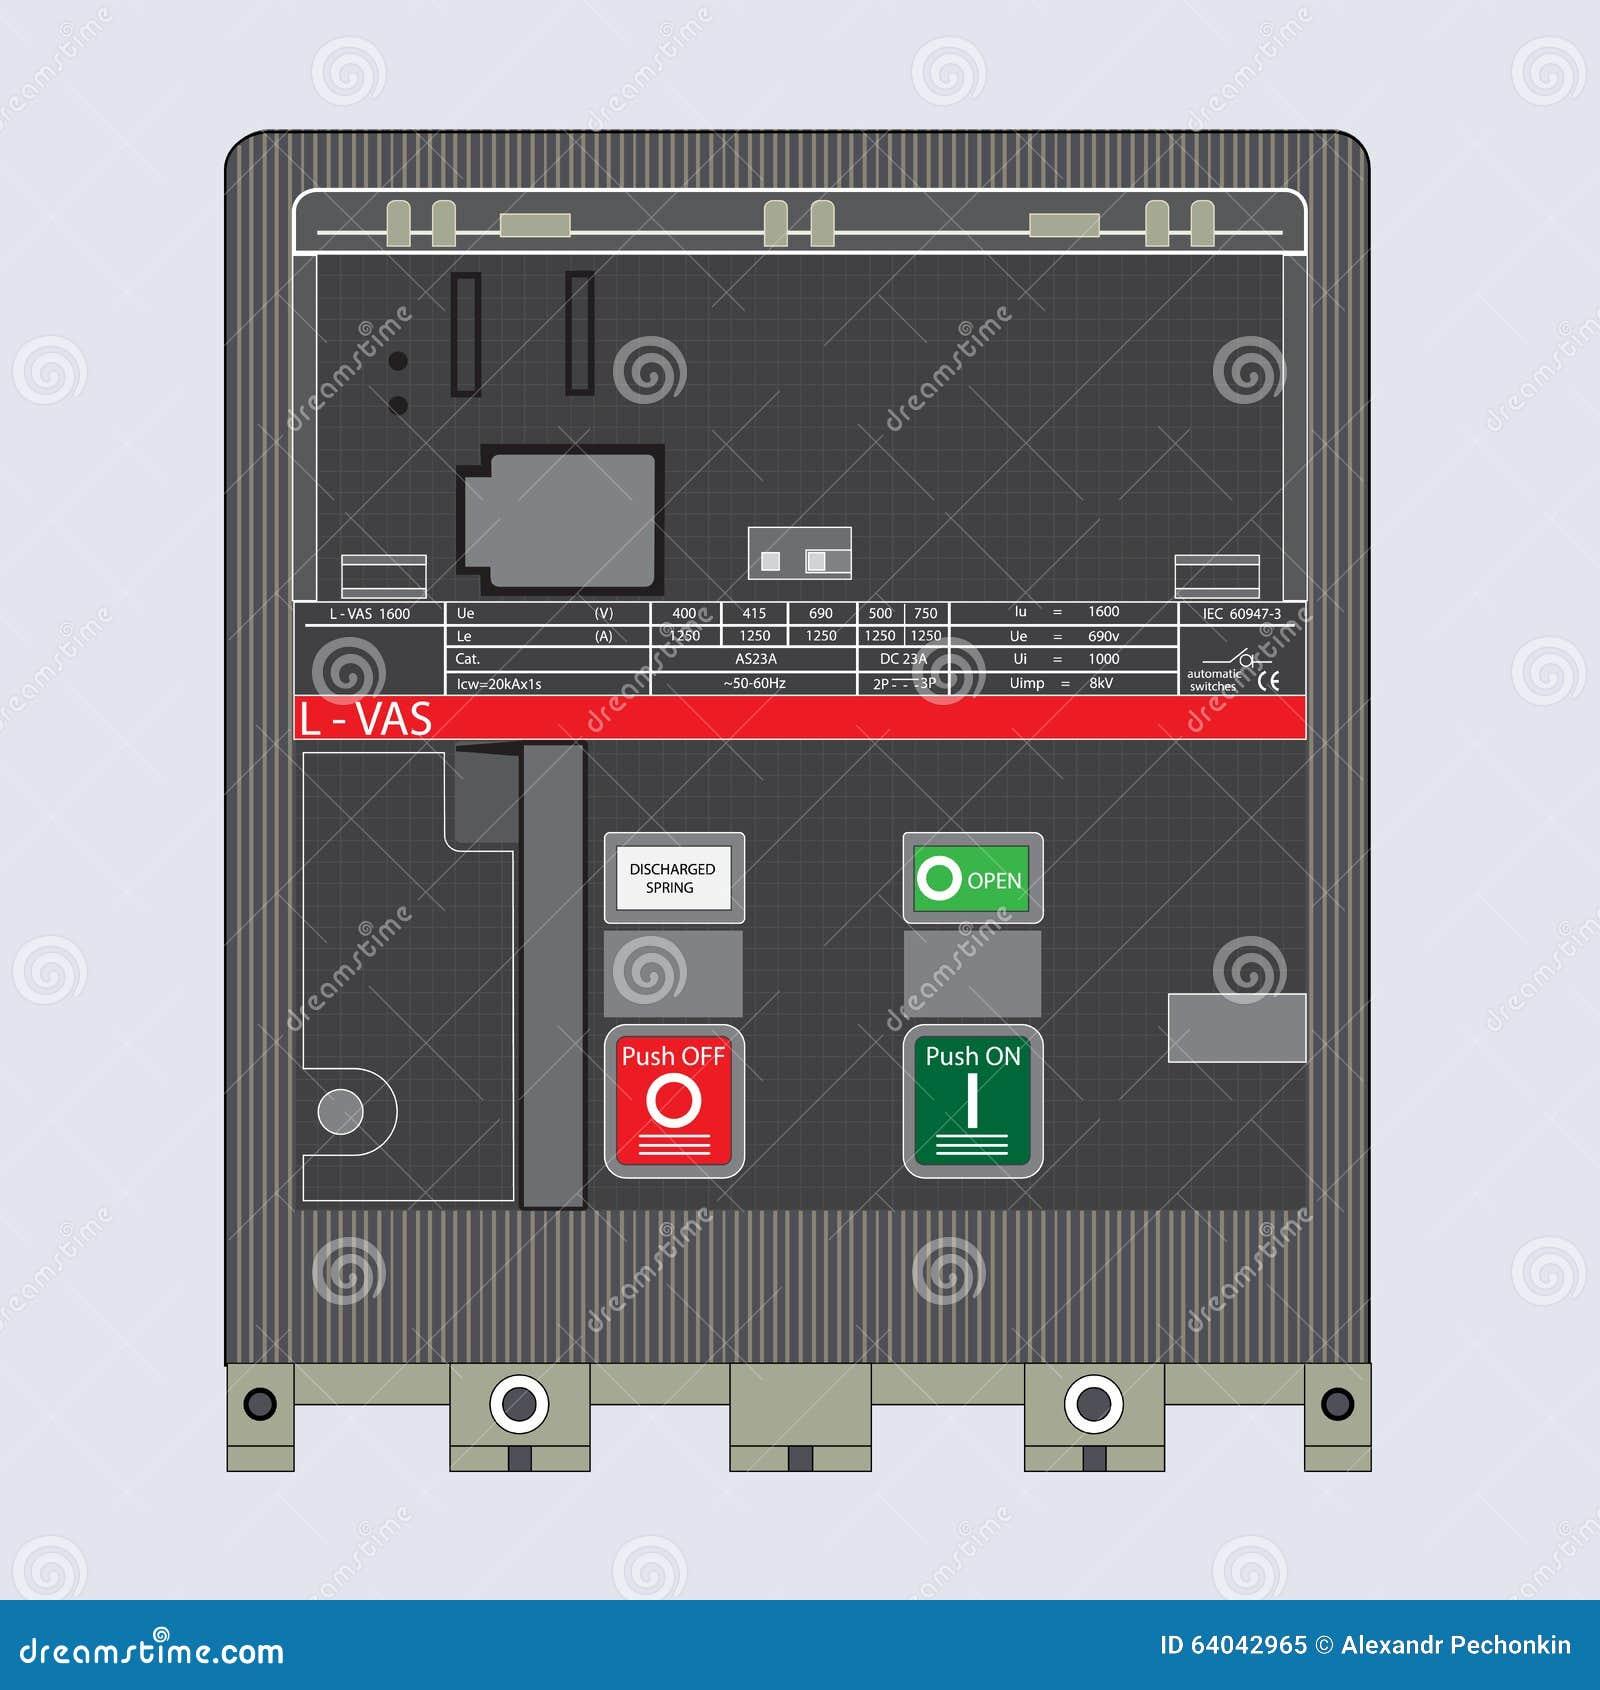 Großartig Unterbrecherplatte Installieren Ideen - Schaltplan Serie ...